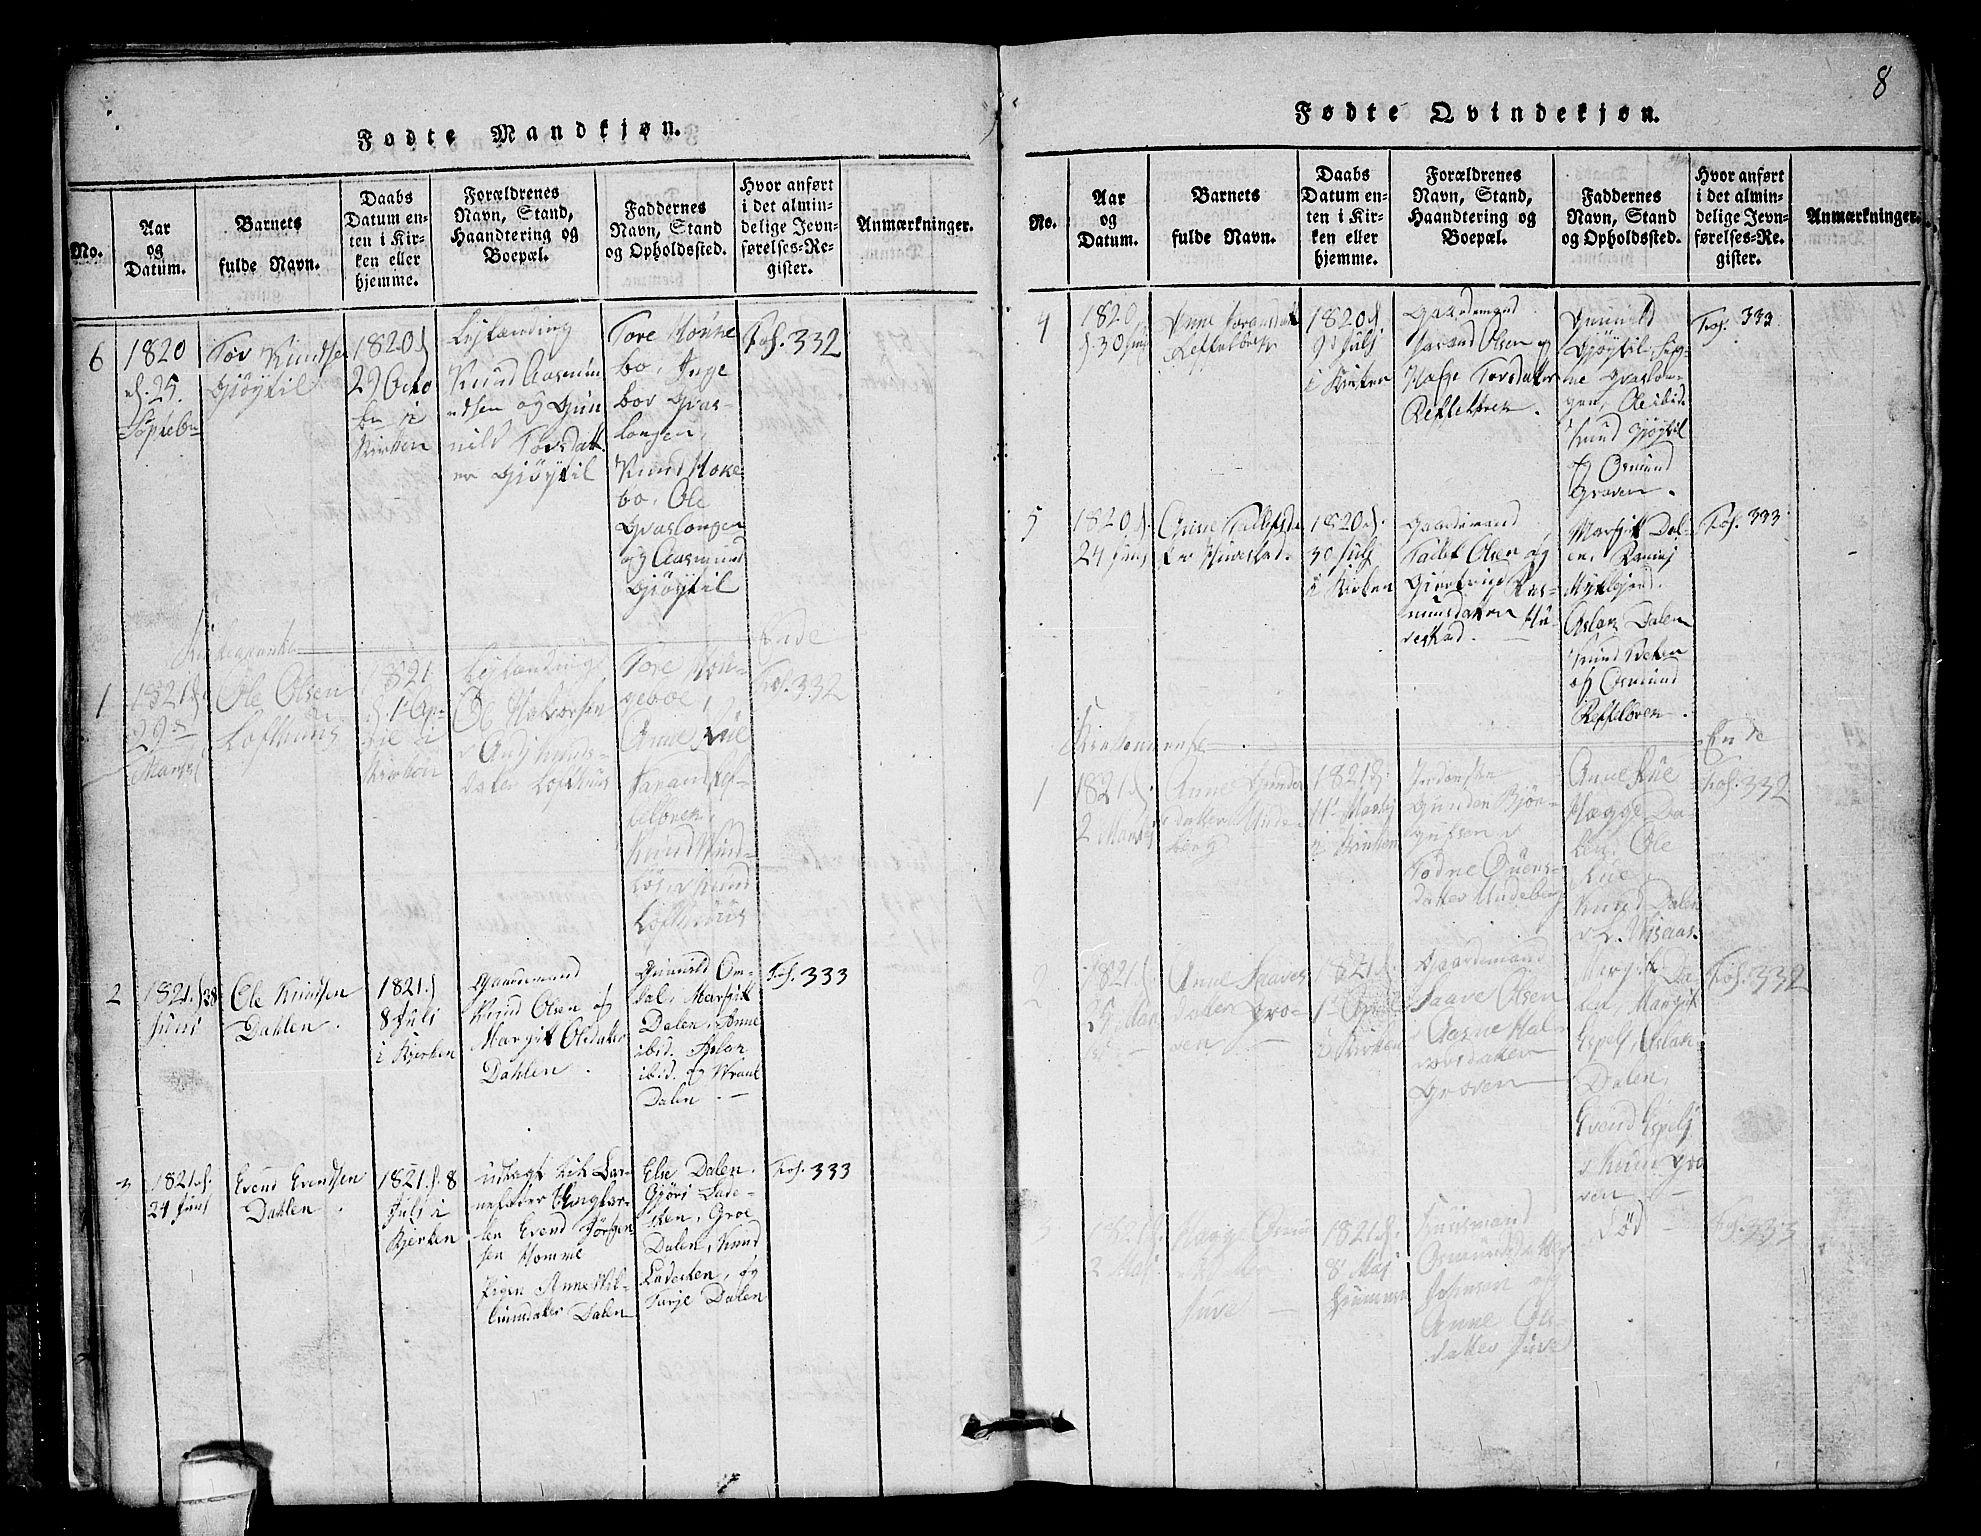 SAKO, Lårdal kirkebøker, G/Gb/L0001: Klokkerbok nr. II 1, 1815-1865, s. 8